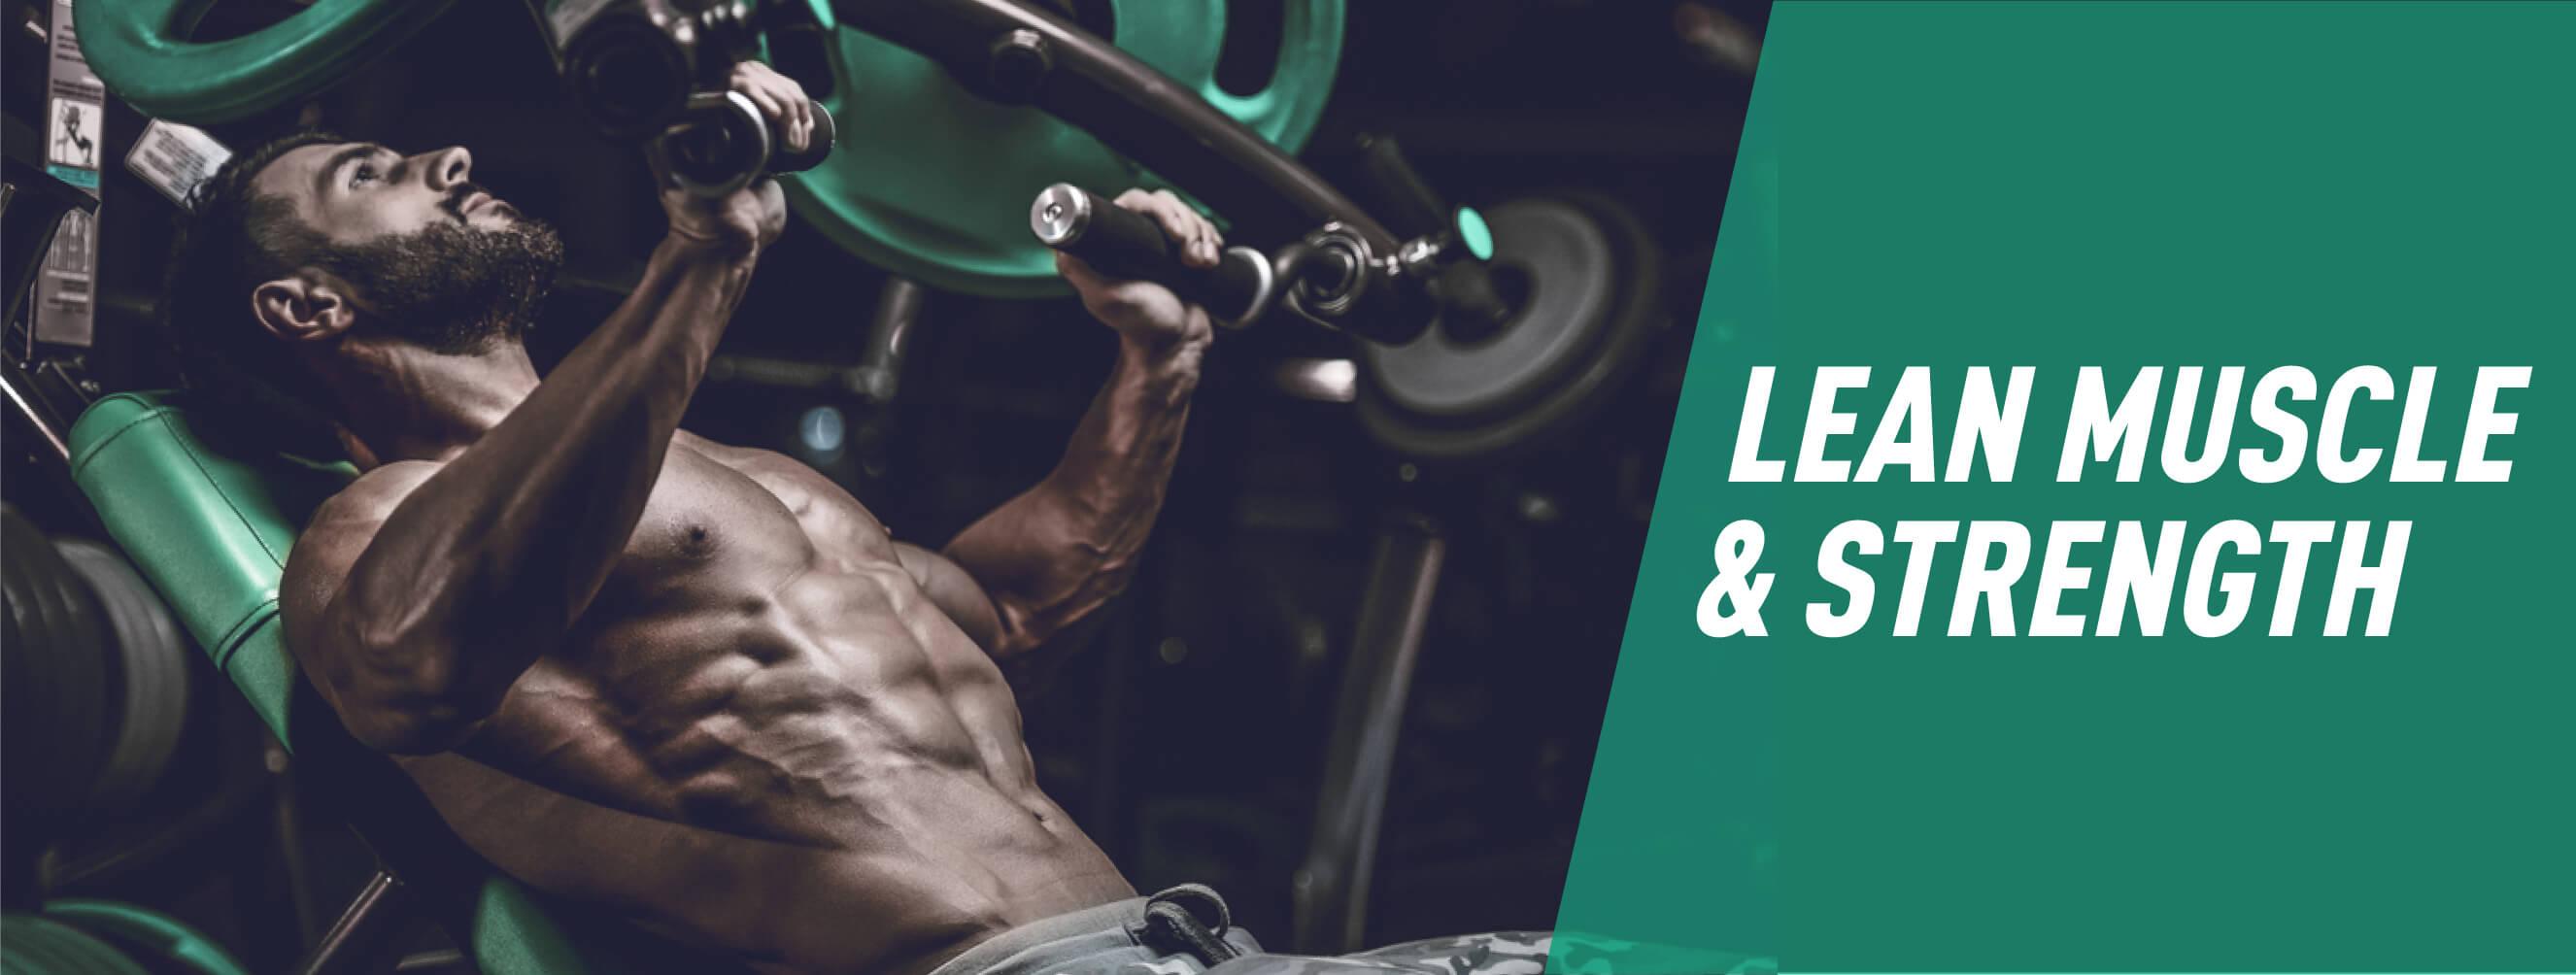 Lean Muscle & Strength - Online Programme